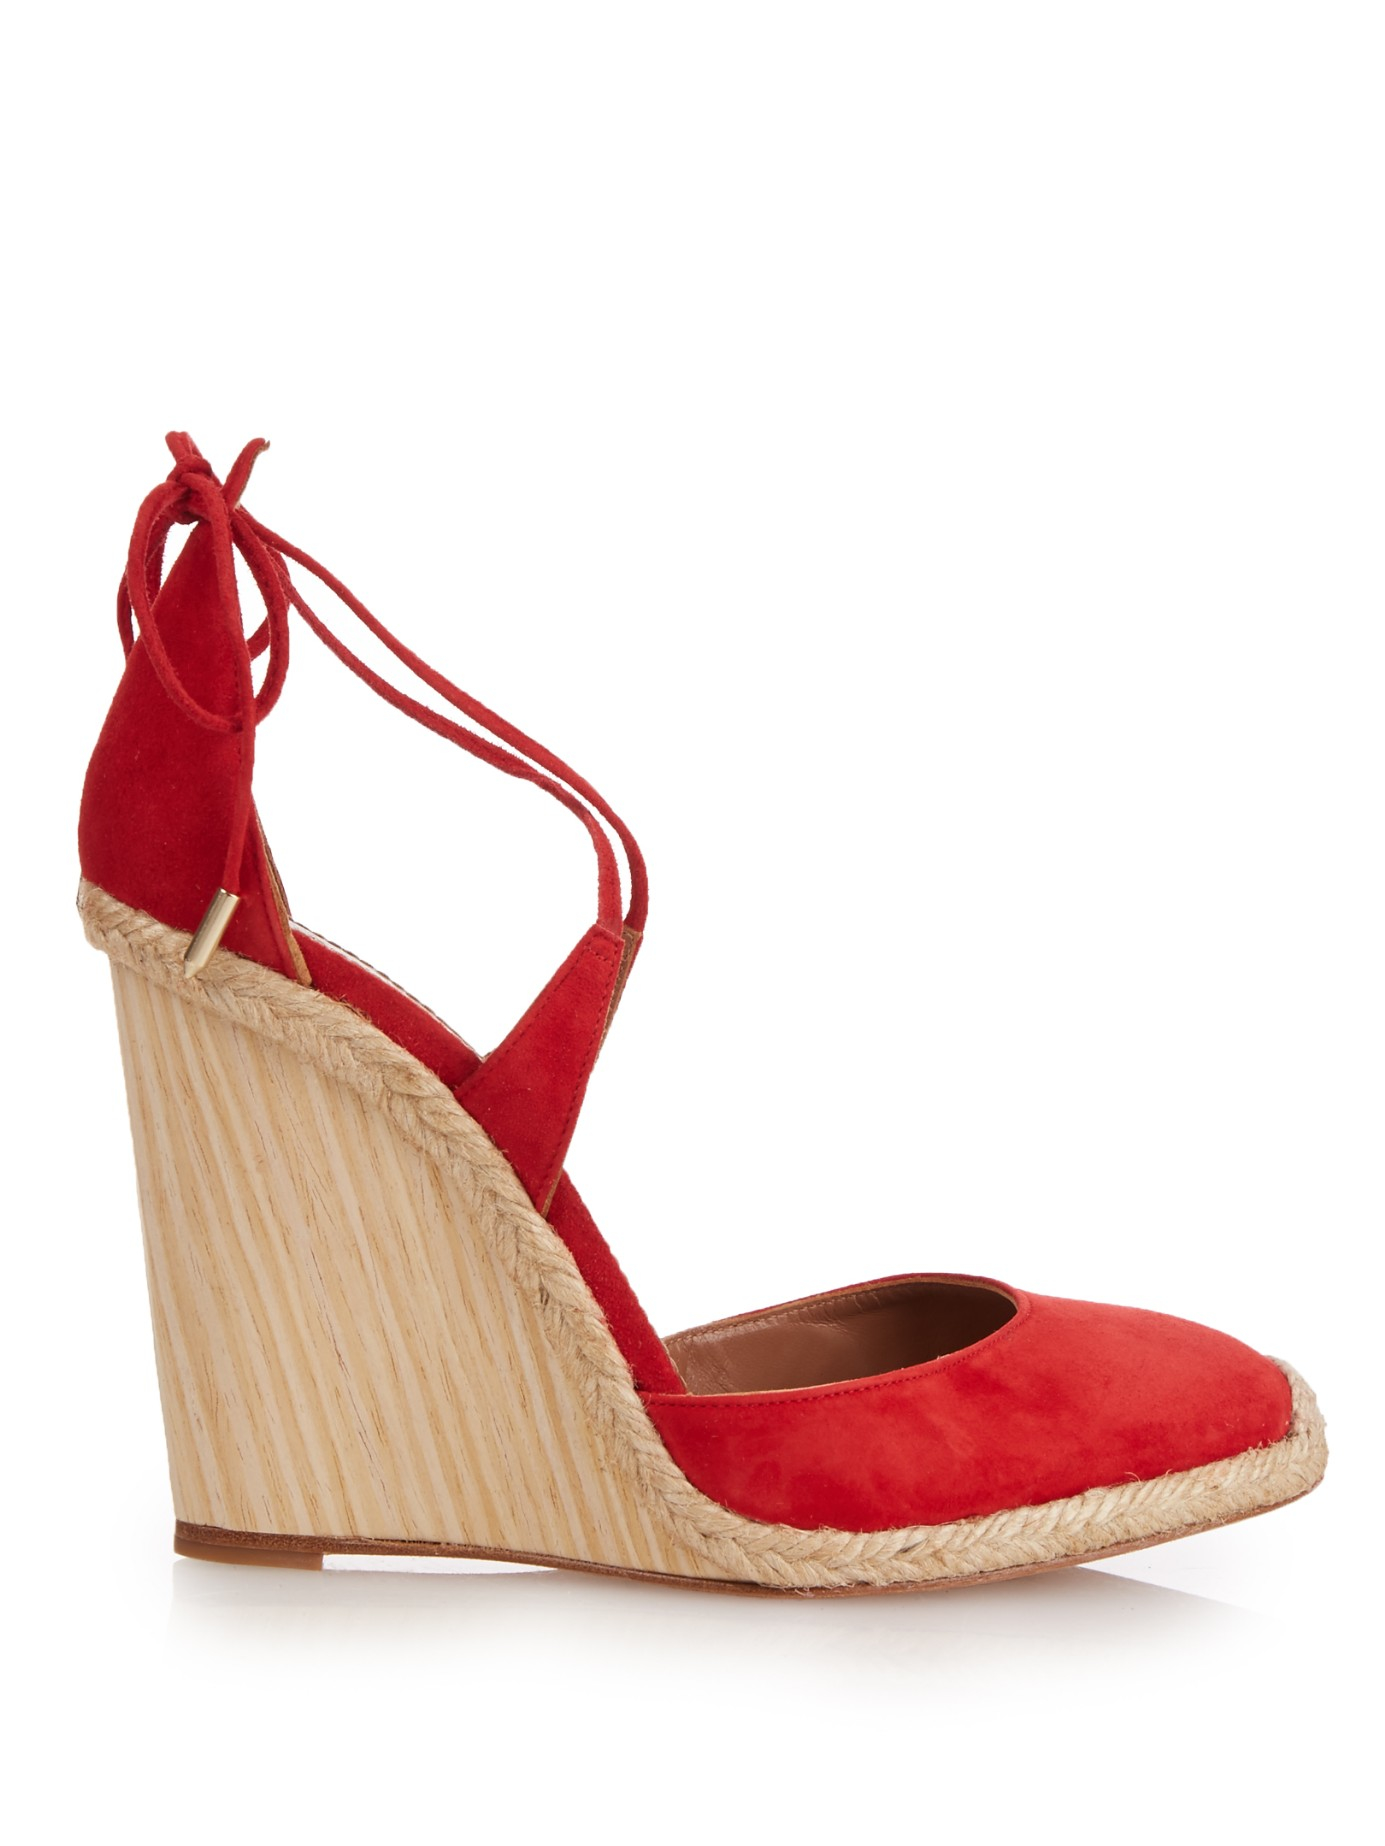 Lyst Aquazzura Karlie Espadrille Wedge Heels In Red